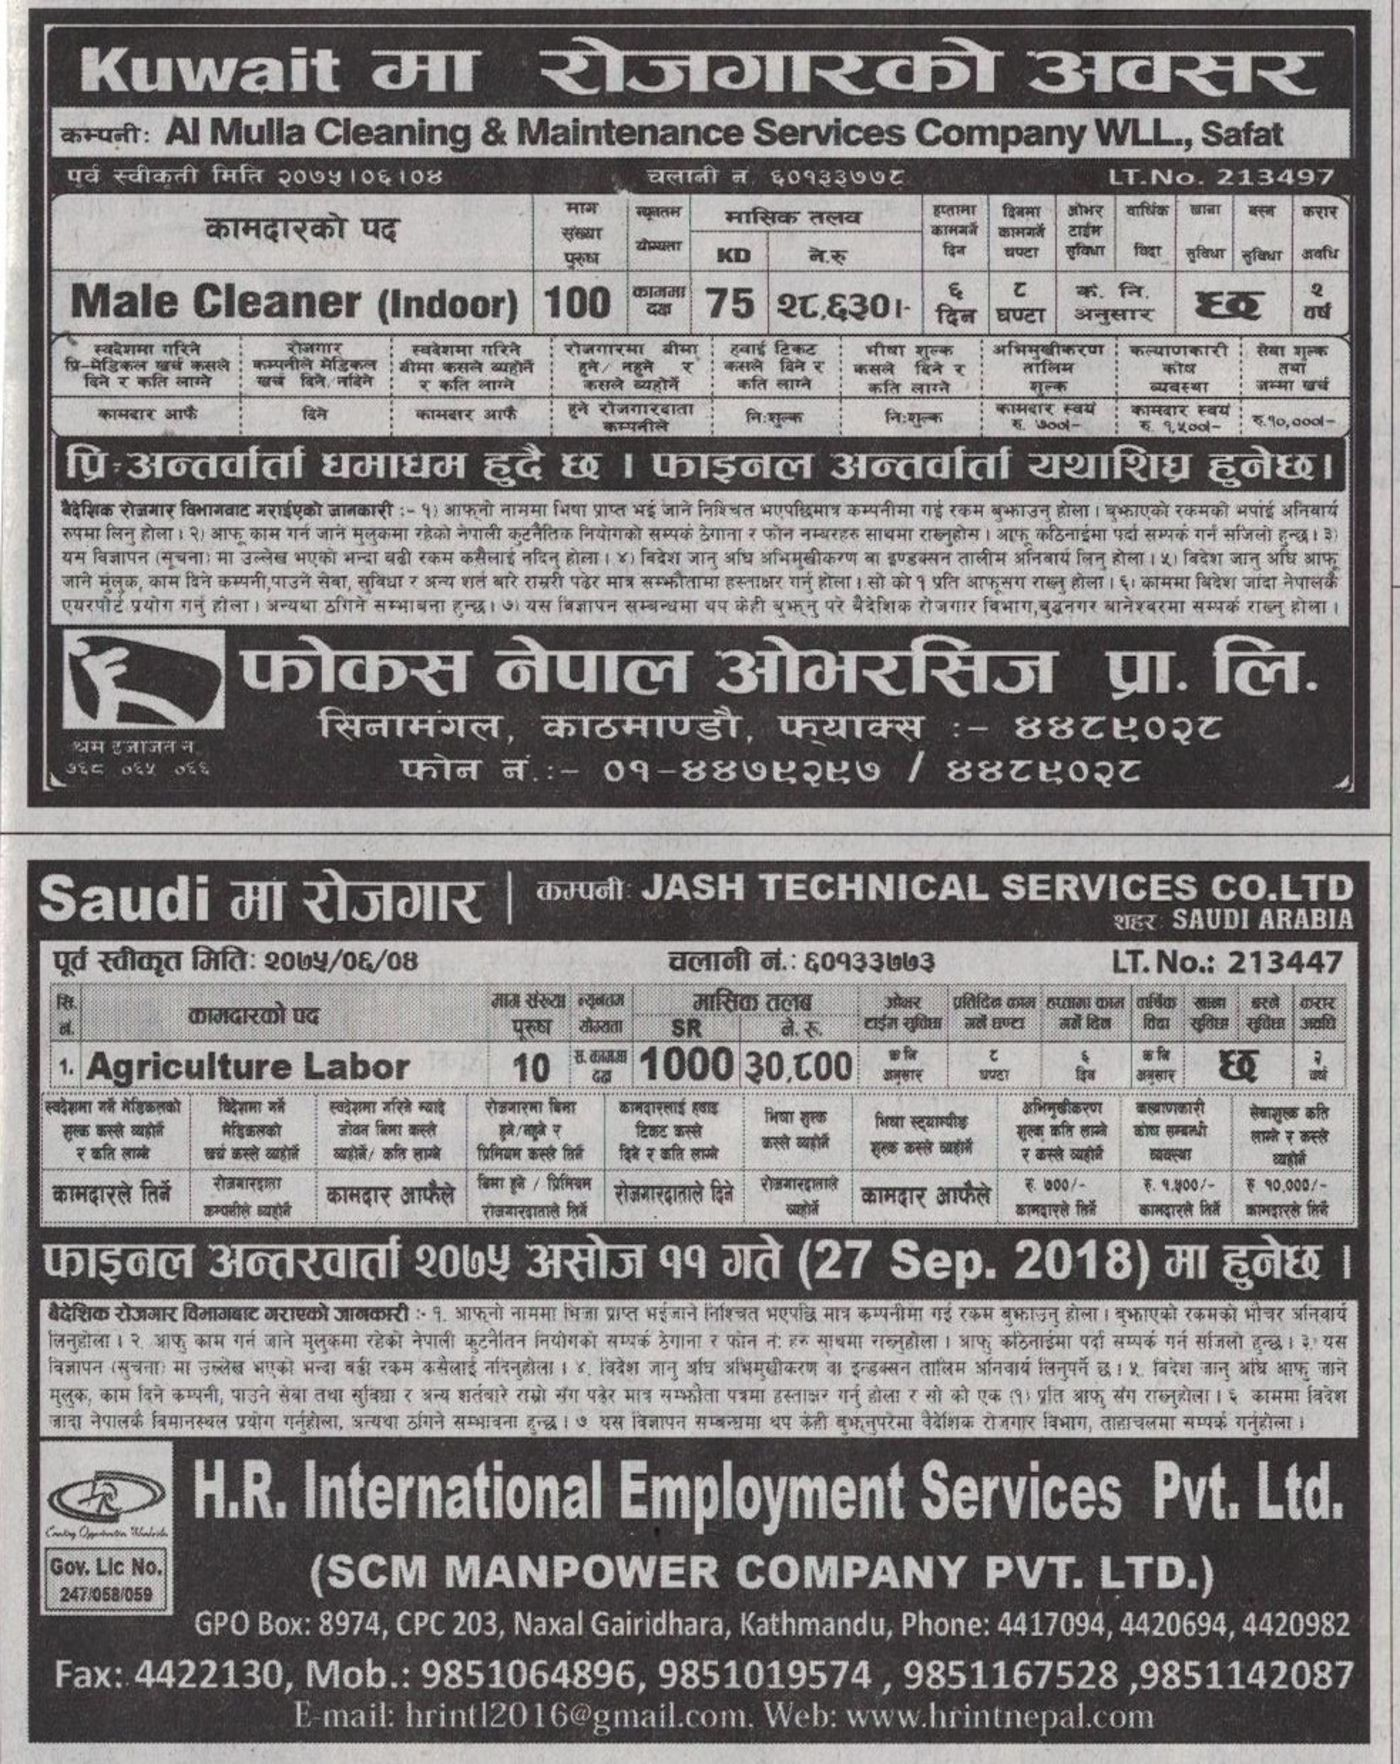 Jobs Nepal - Vacancy at Kuwait and Saudi Arabia - Male Cleaner and